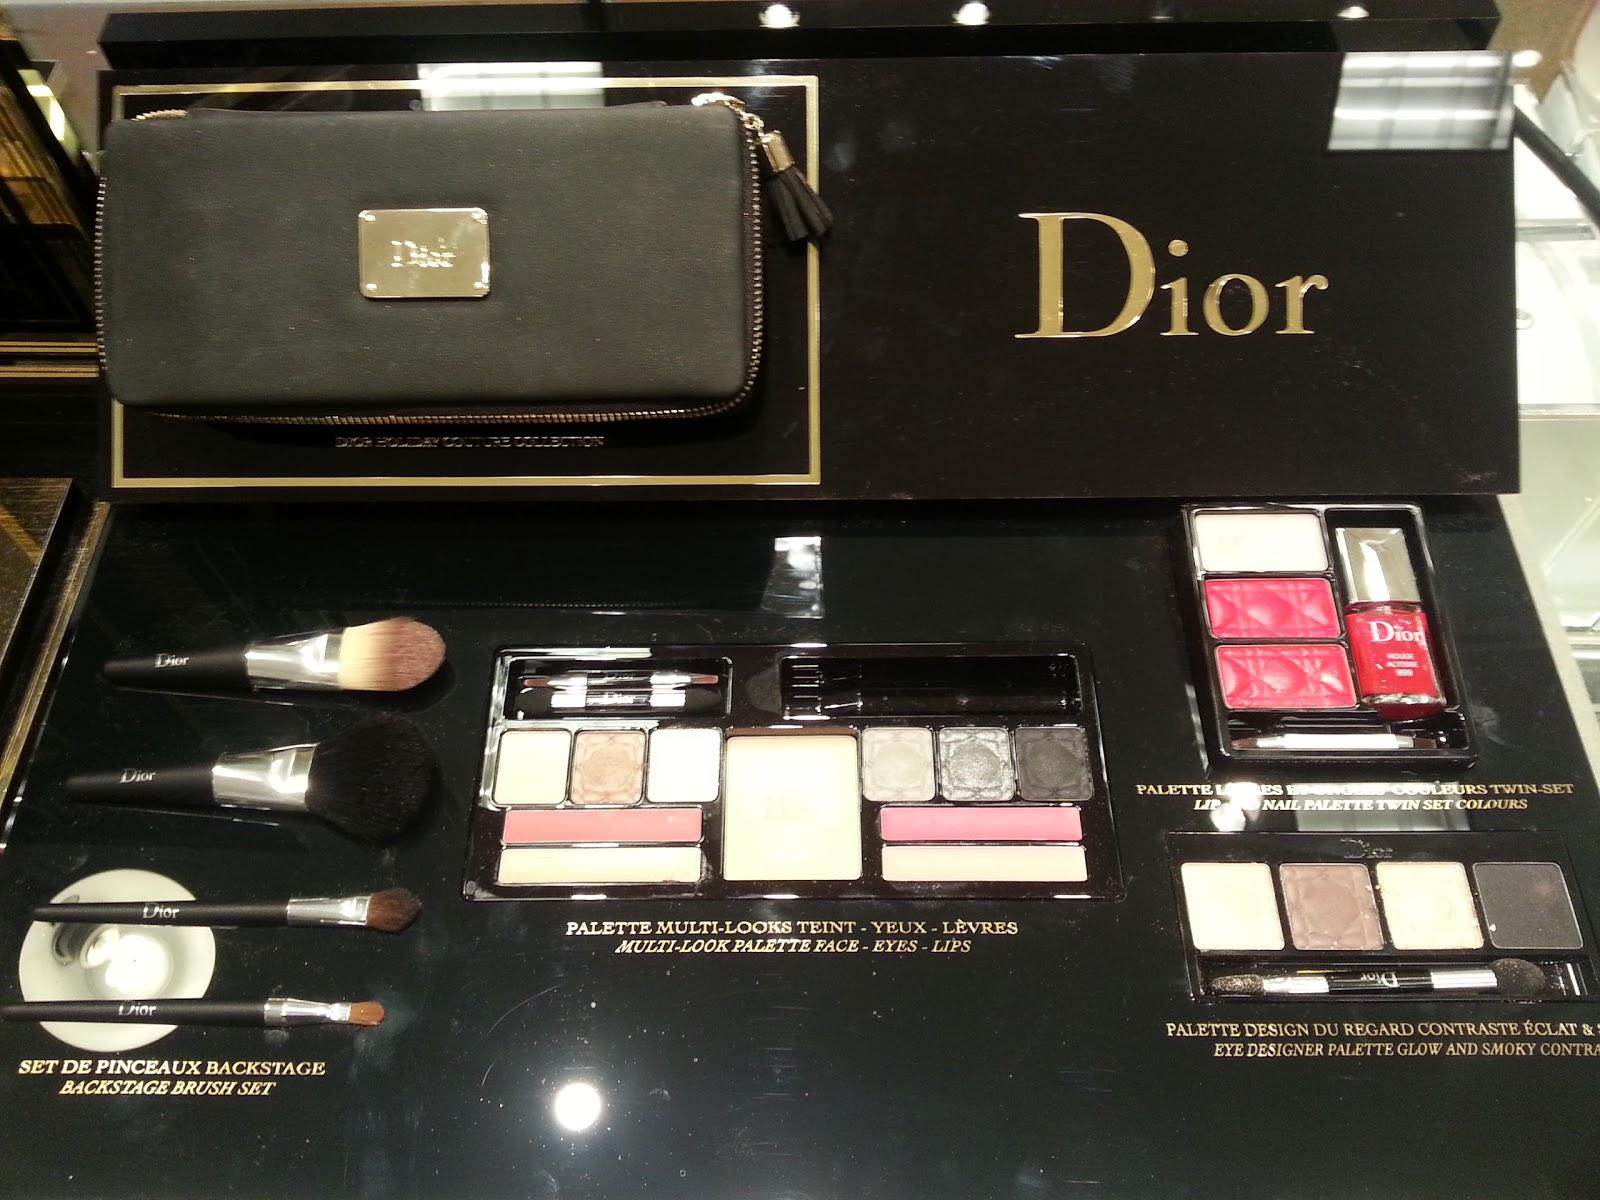 Lipstick & Chiffon : Holiday Sets from Dior